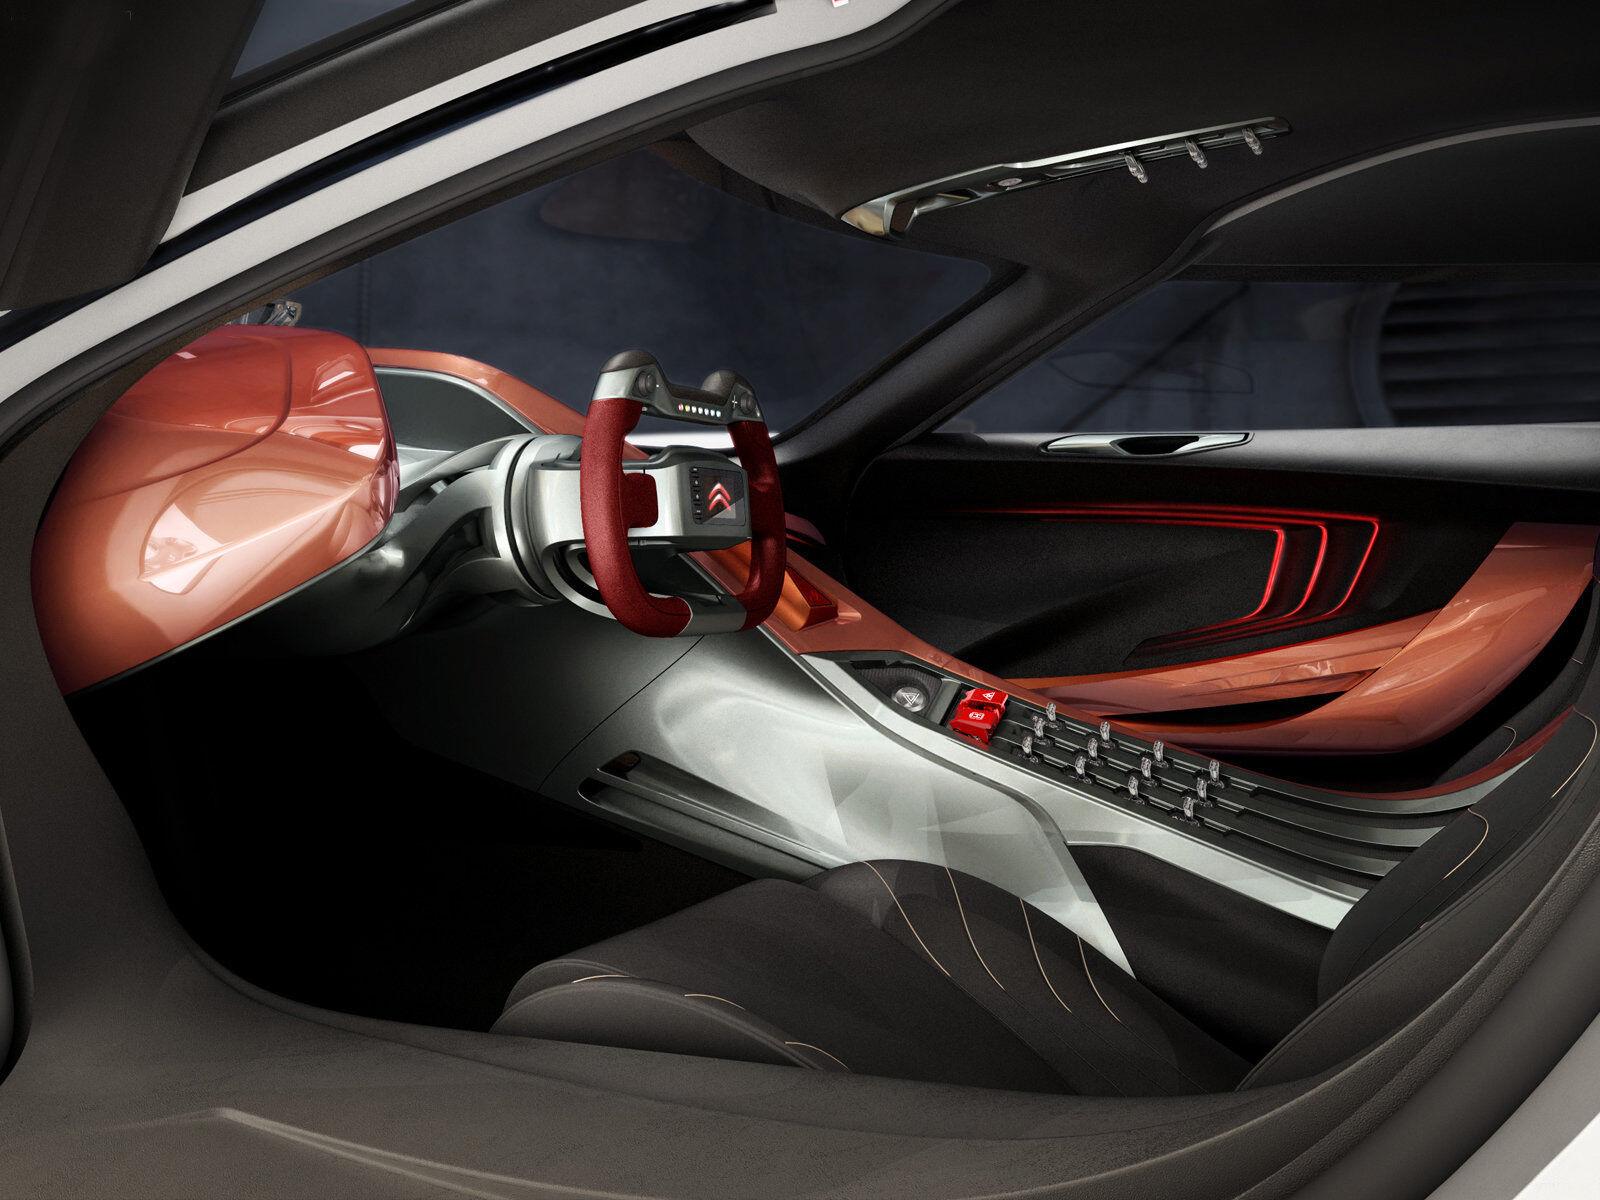 Sport Auto De Carrera Ferrari F 1 Racing GT 43 concepto 12 exótico 18 Dream 24